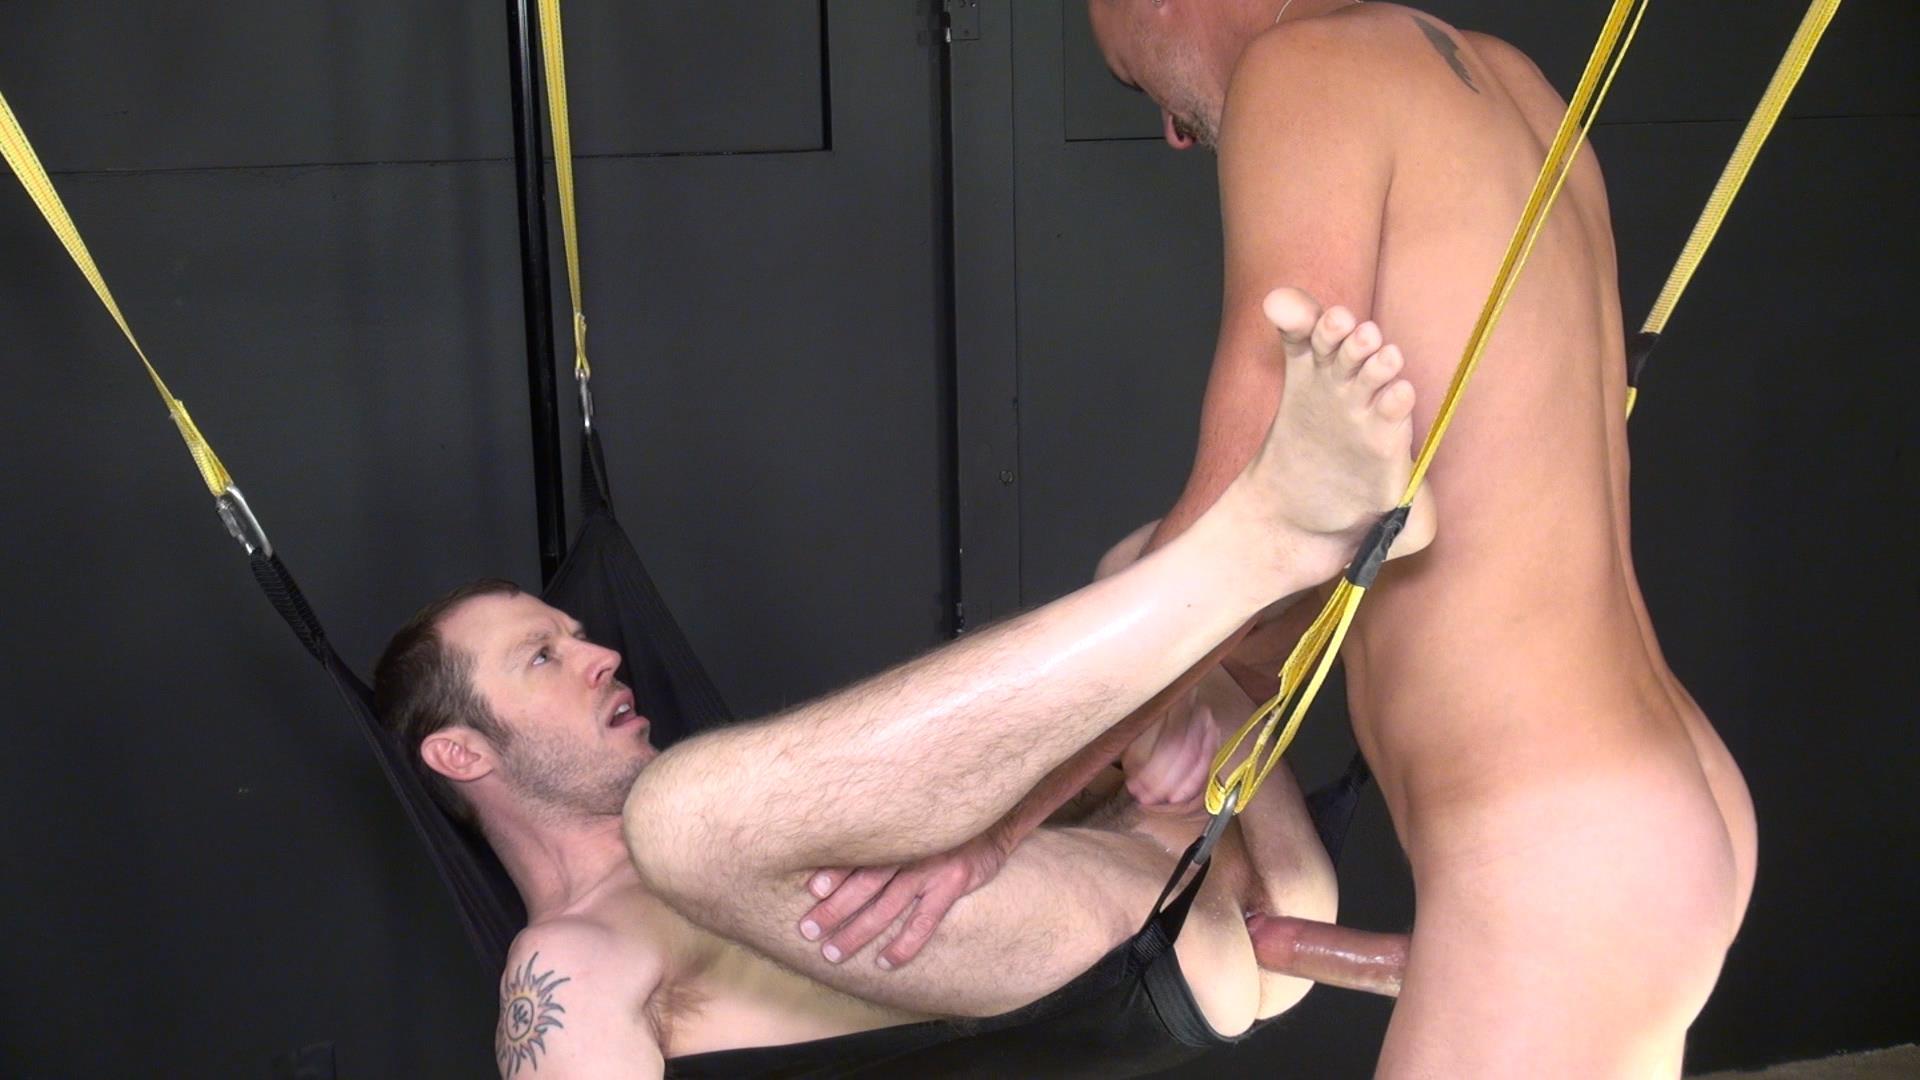 Raw-and-Rough-Blake-Dawson-and-Super-Steve-Horse-Cock-Bareback-Breeding-Amateur-Gay-Porn-05 Huge Cock Bareback Breeding A Tight Hole In A Sex Sling